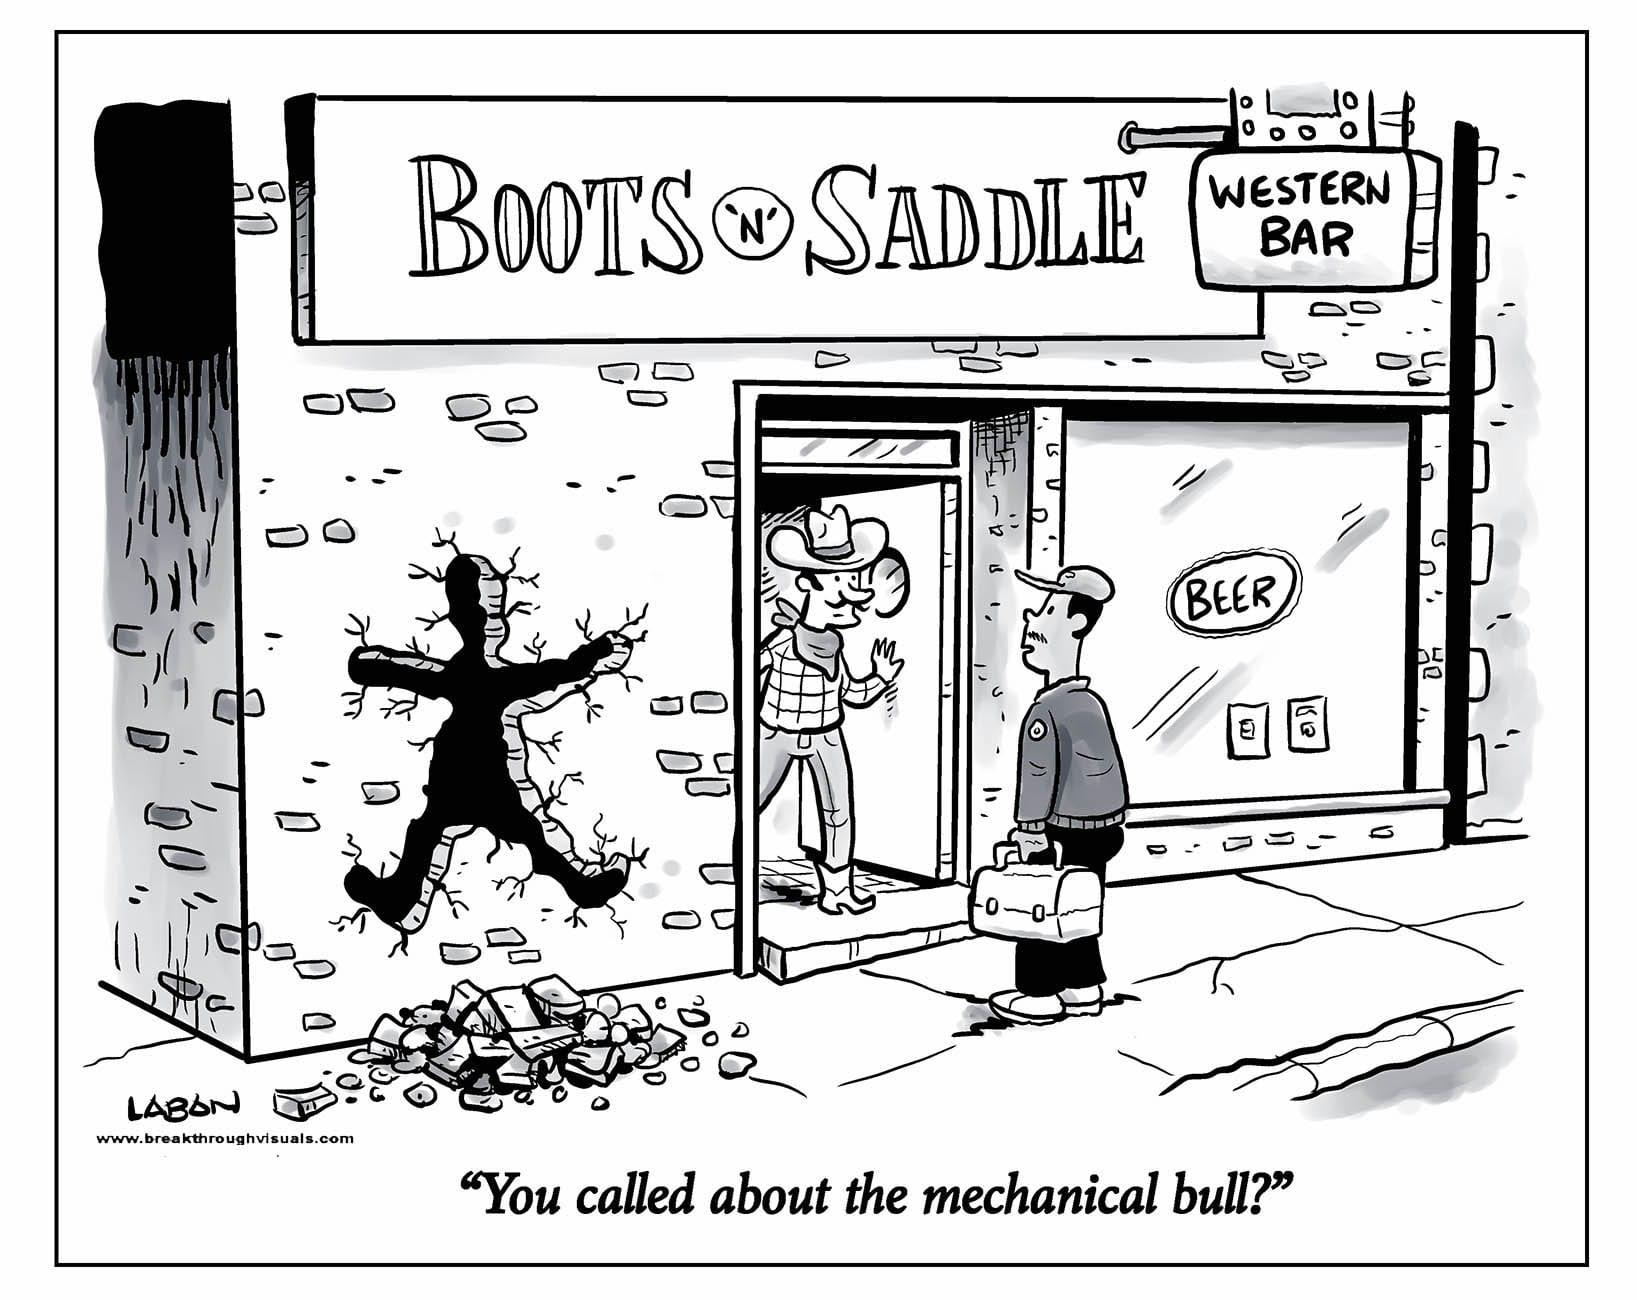 Comic Brake: Can You Blame the Bull?